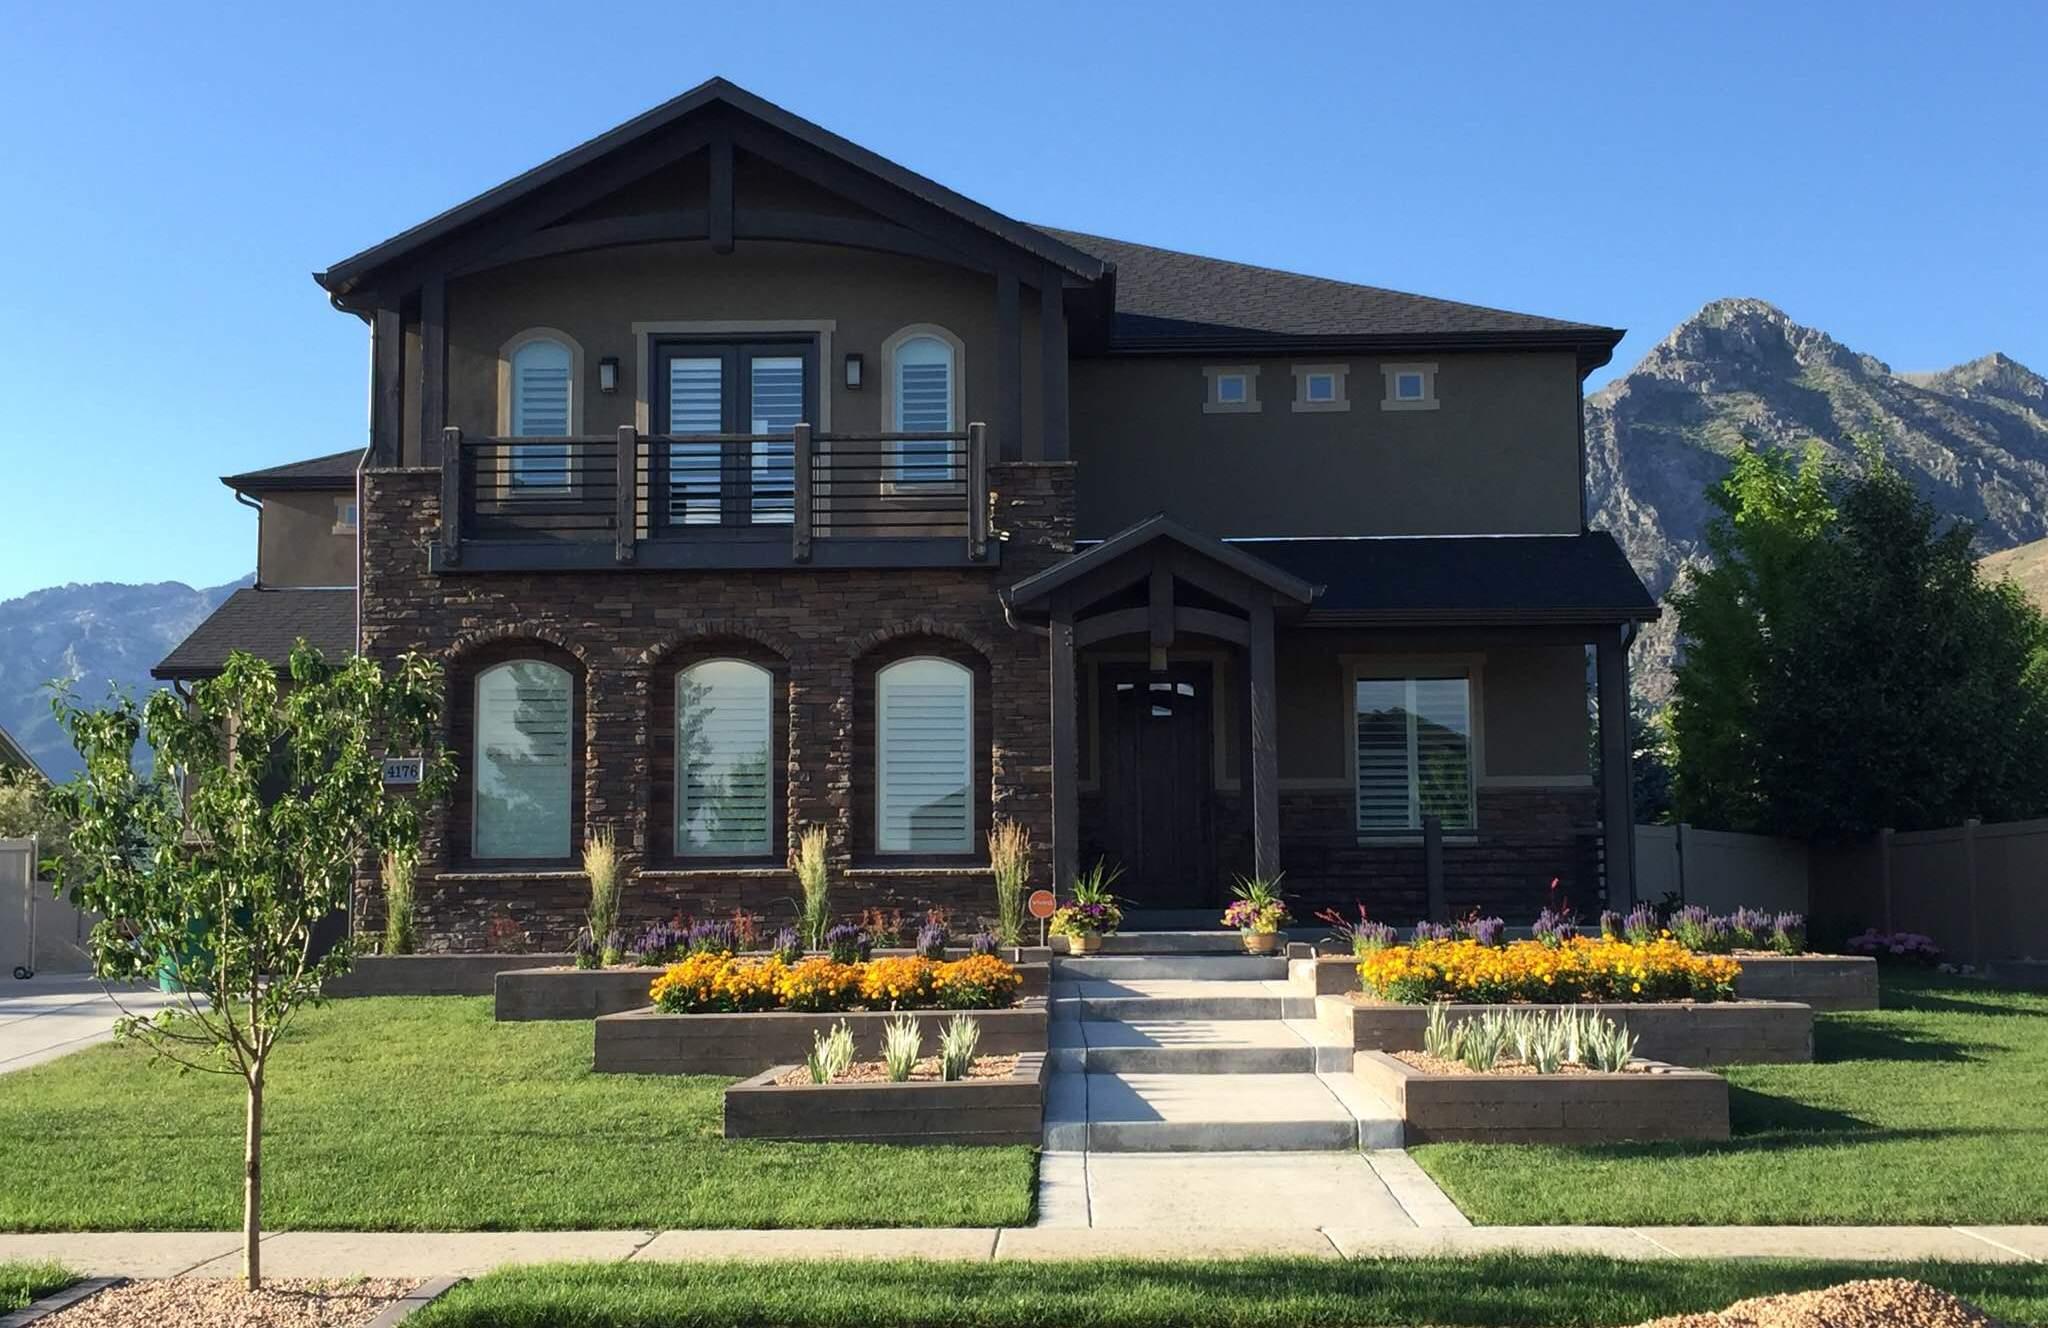 The Lutjemeier Residence - 4176 W Sandalwood Drive